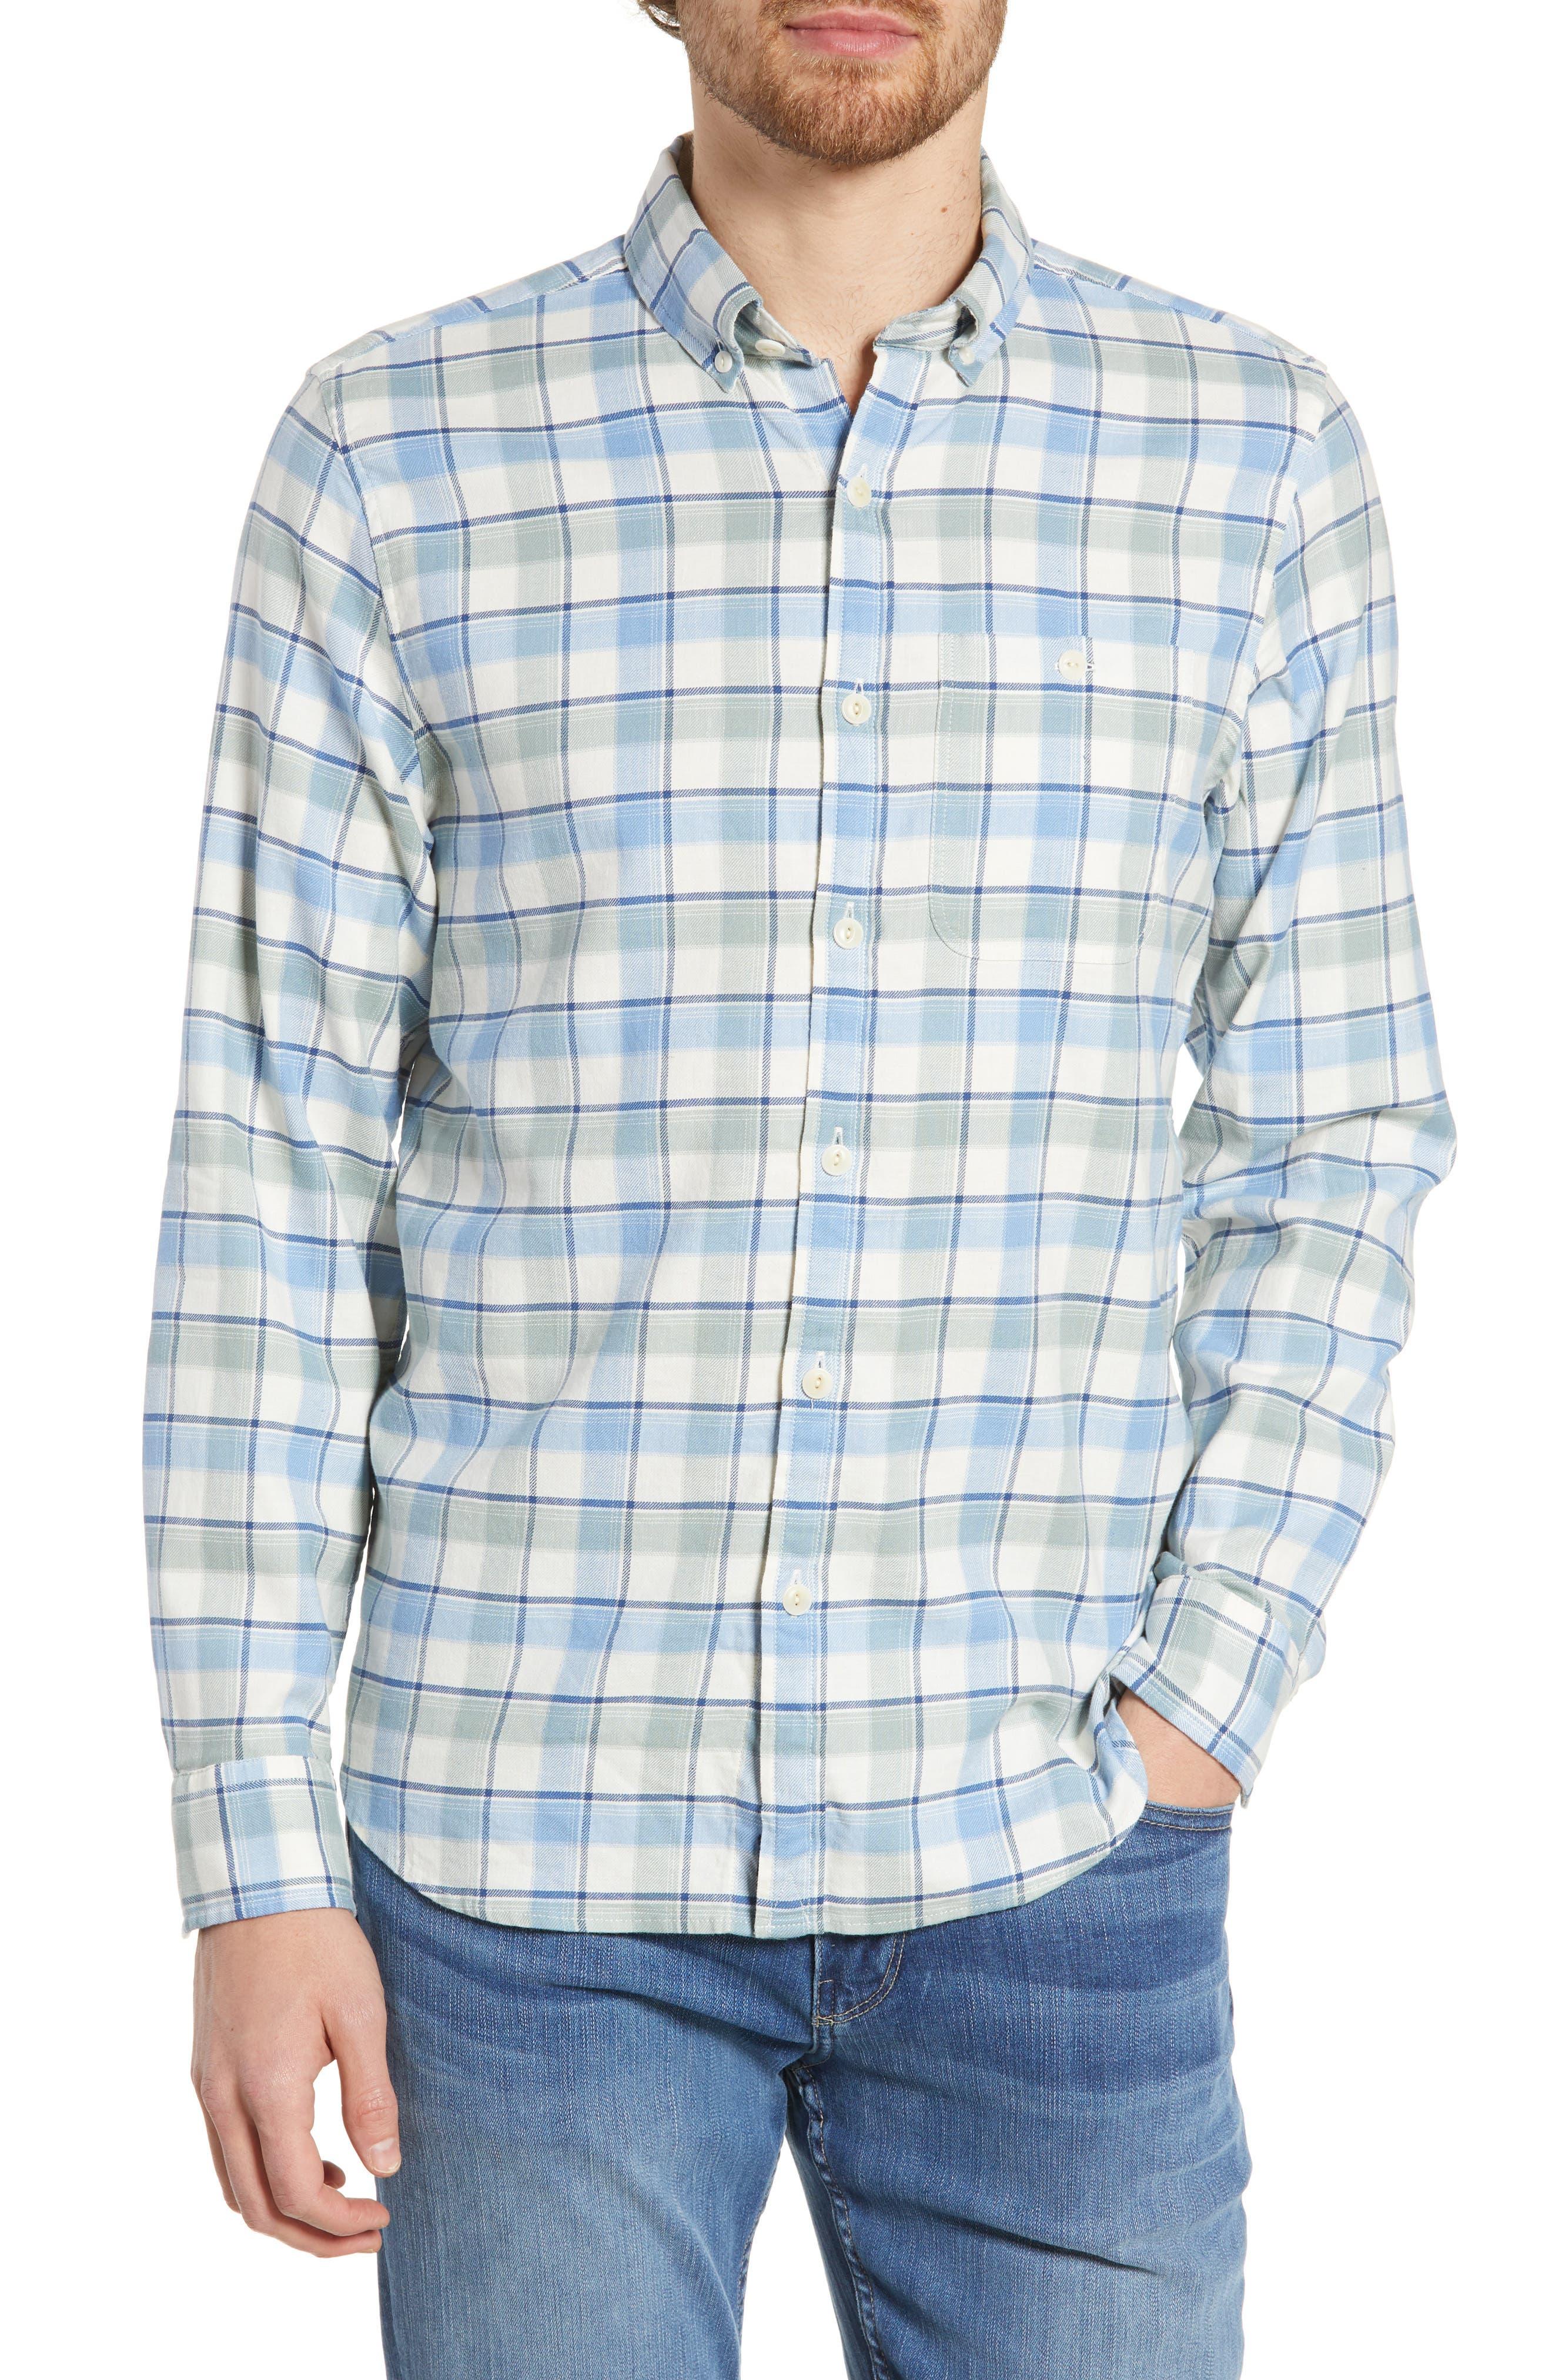 VINEYARD VINES,                             Bayside Slim Fit Plaid Sport Shirt,                             Main thumbnail 1, color,                             LIGHT SAGE